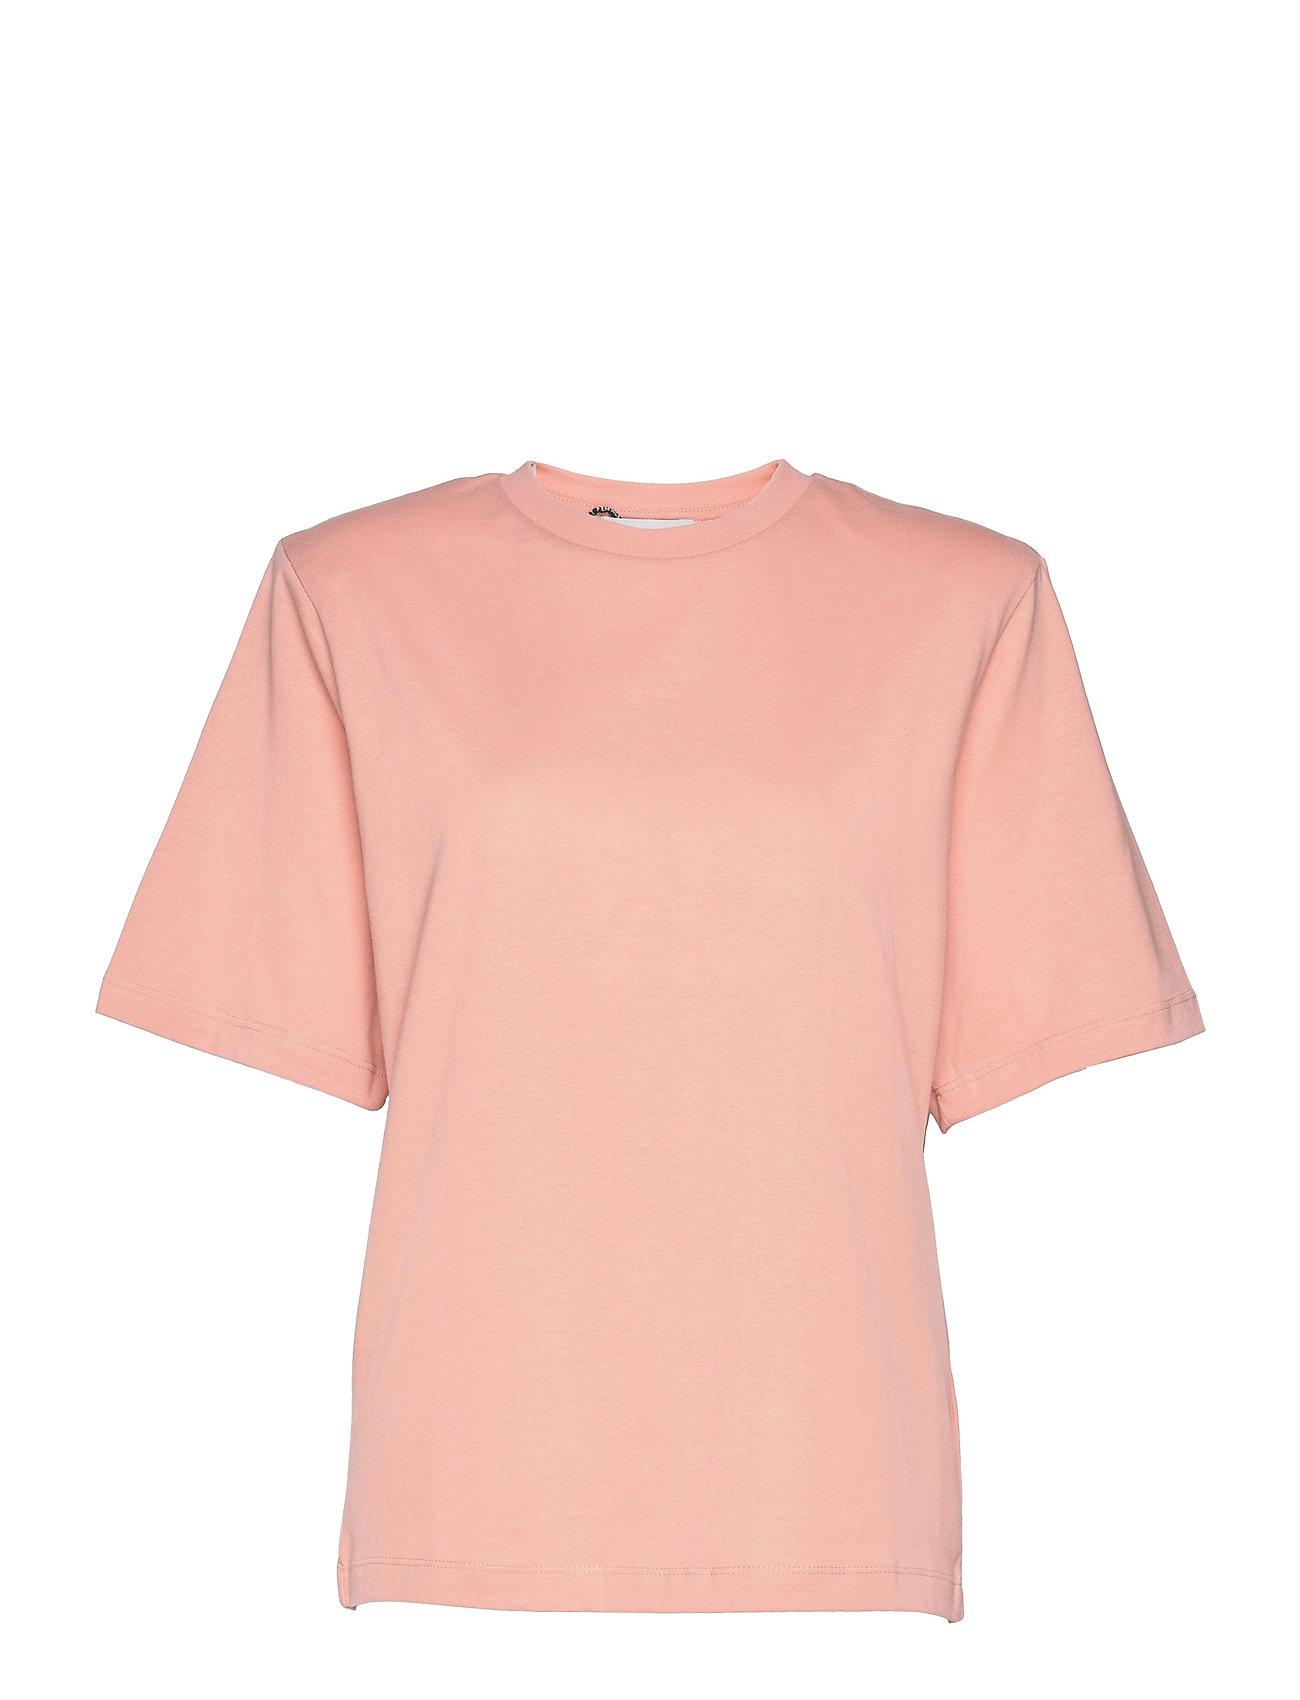 Becker Tee T-shirt Top Lyserød Just Female